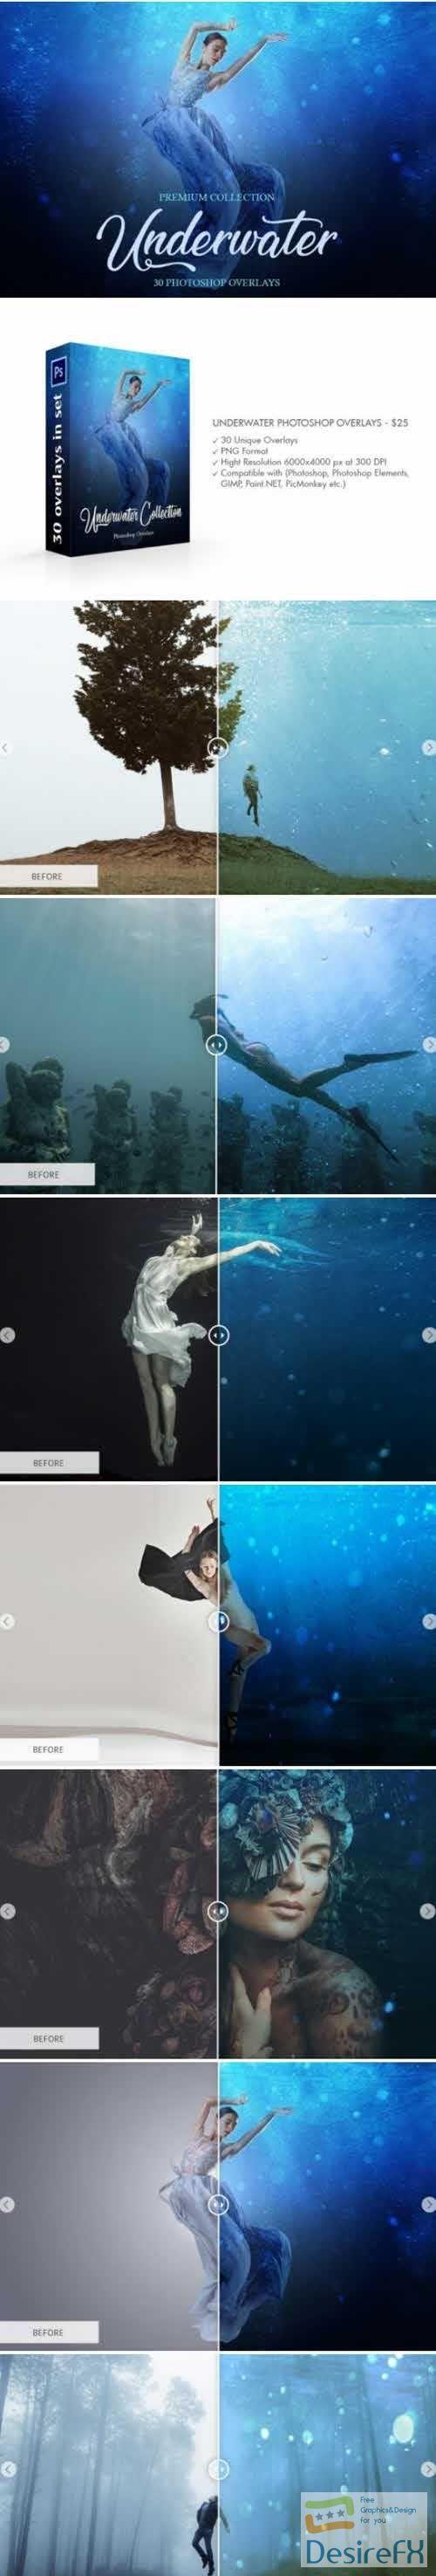 Underwater Photoshop Overlays 4736171